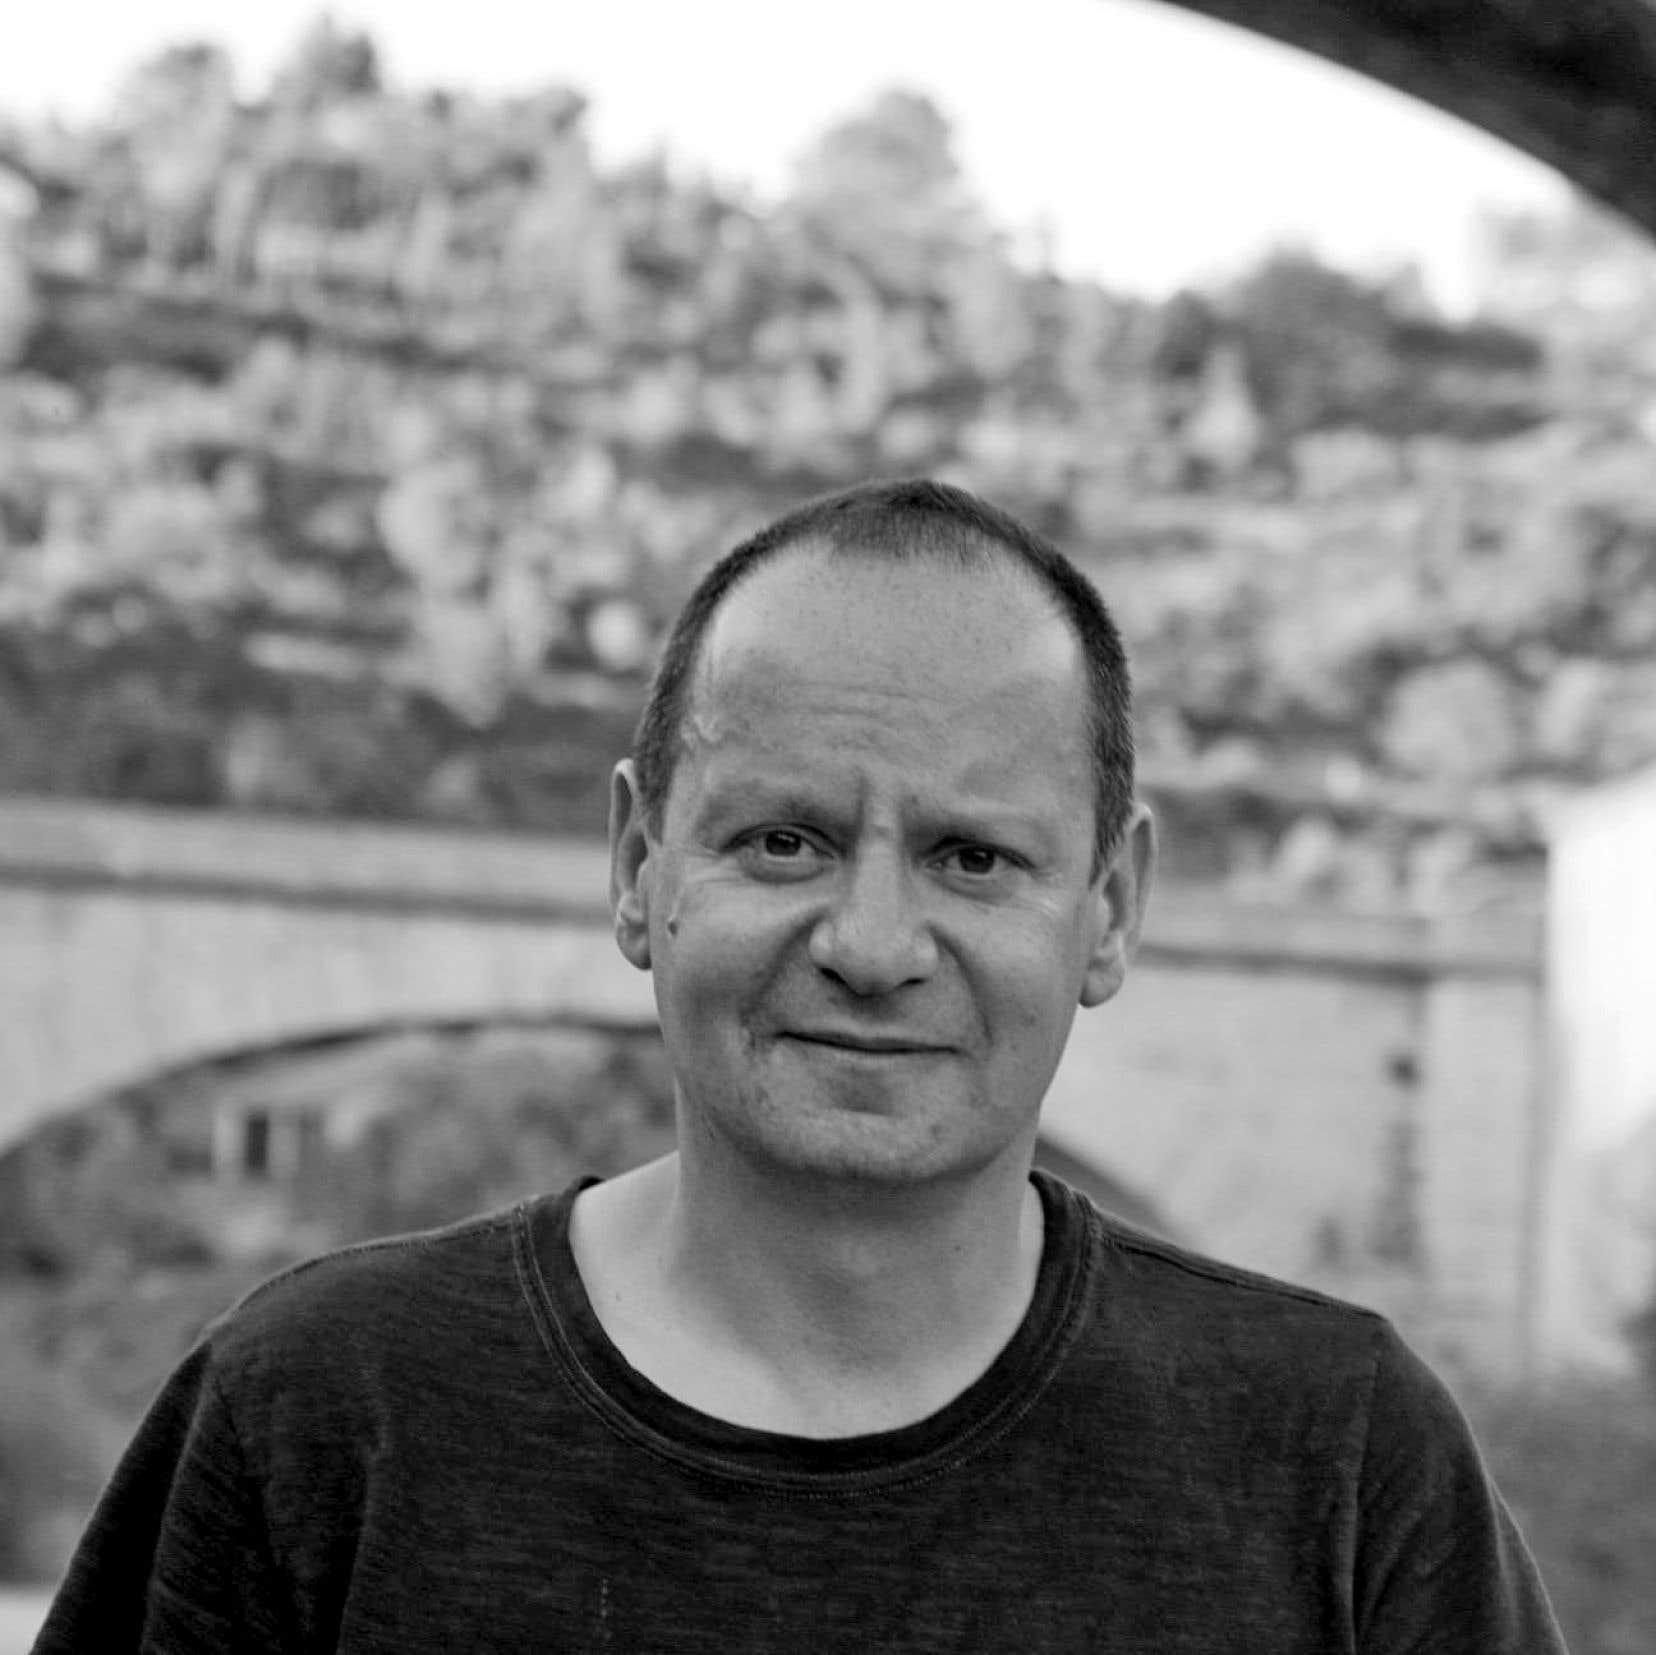 Philippe Sands